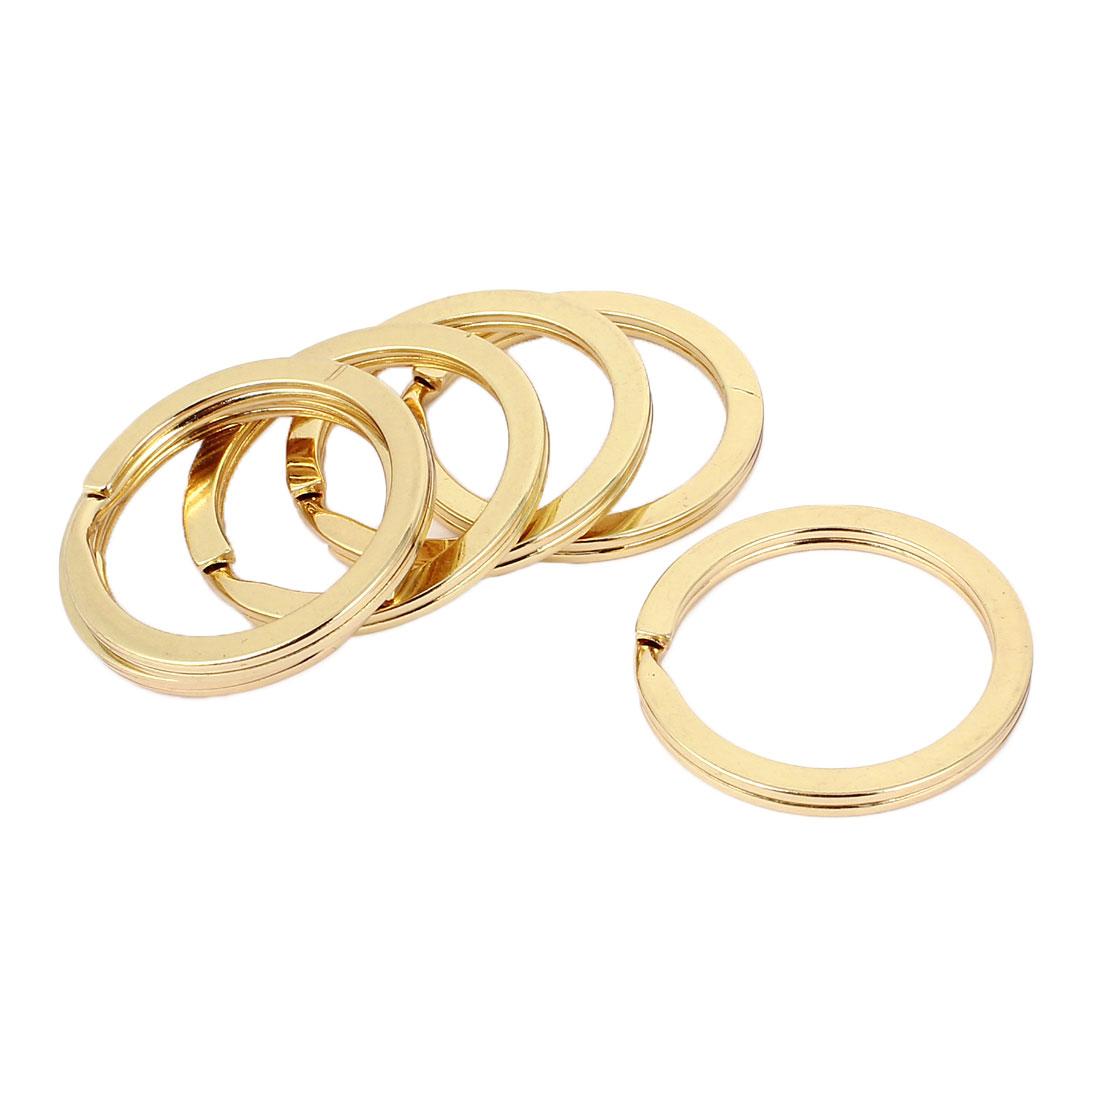 Metal Round Flat Split Loop Key Rings Holders Keyring Gold Tone 33mm Dia 6 Pcs